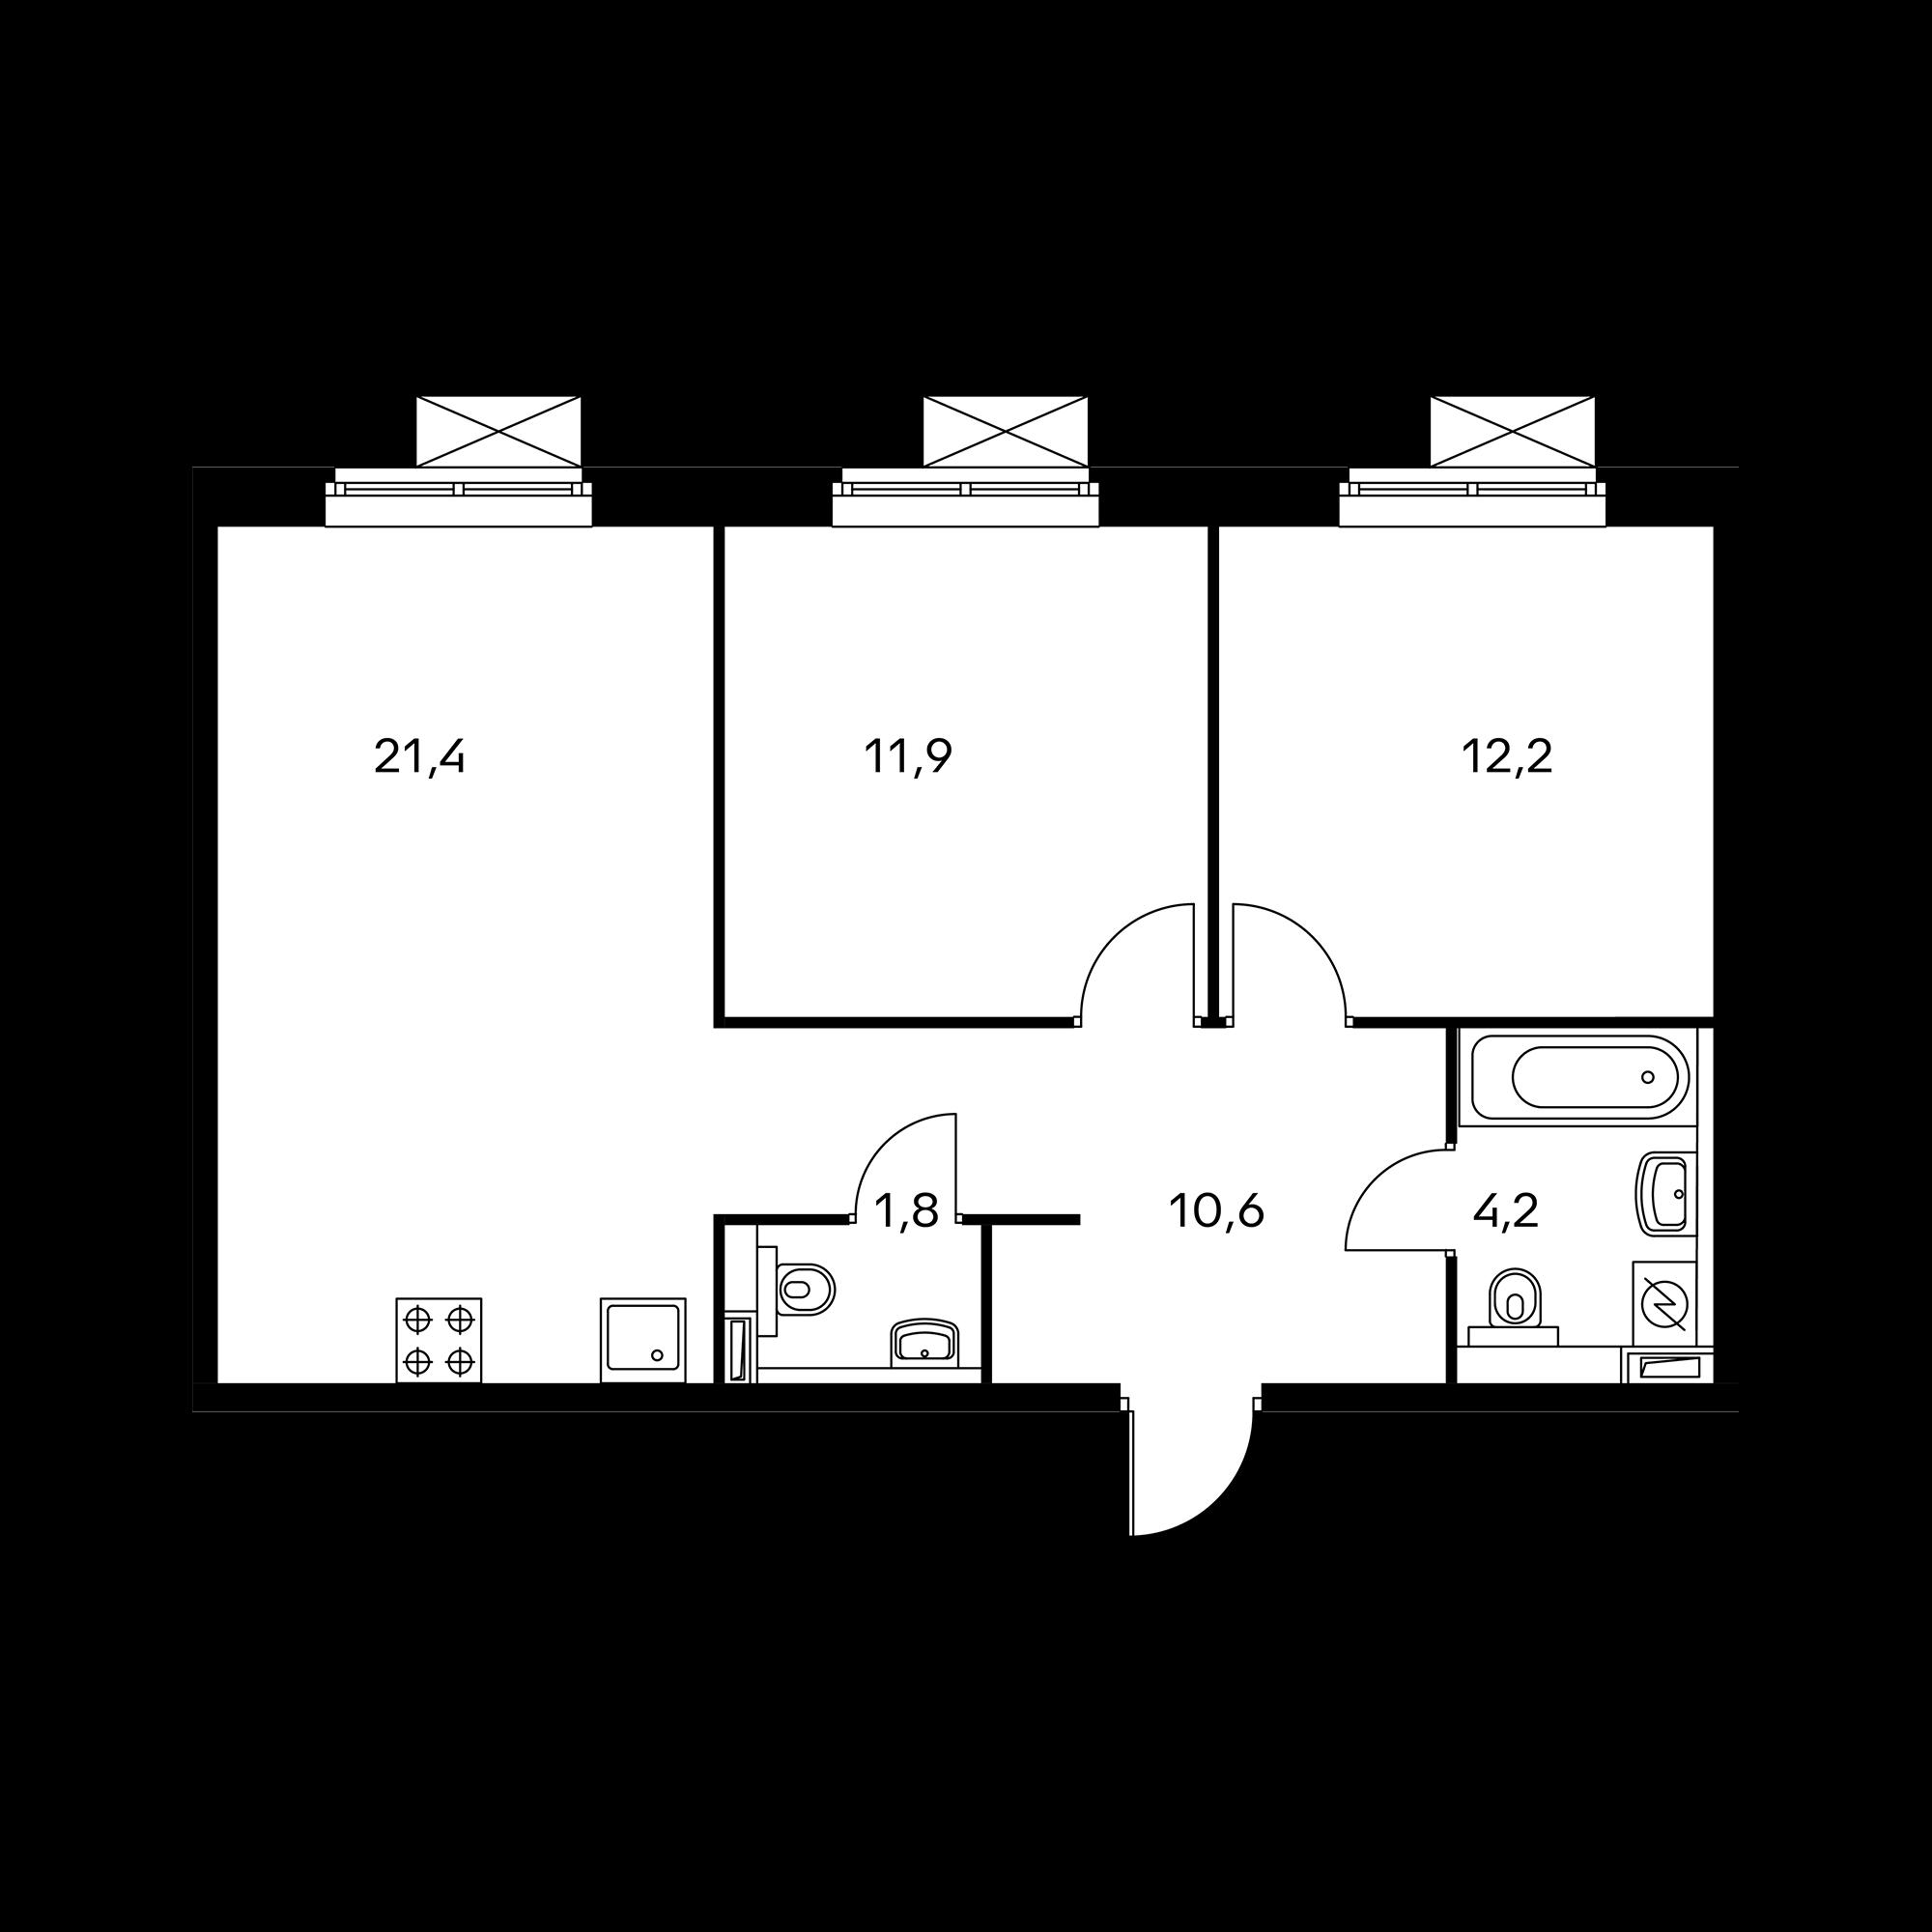 2EL8_10.8-1*